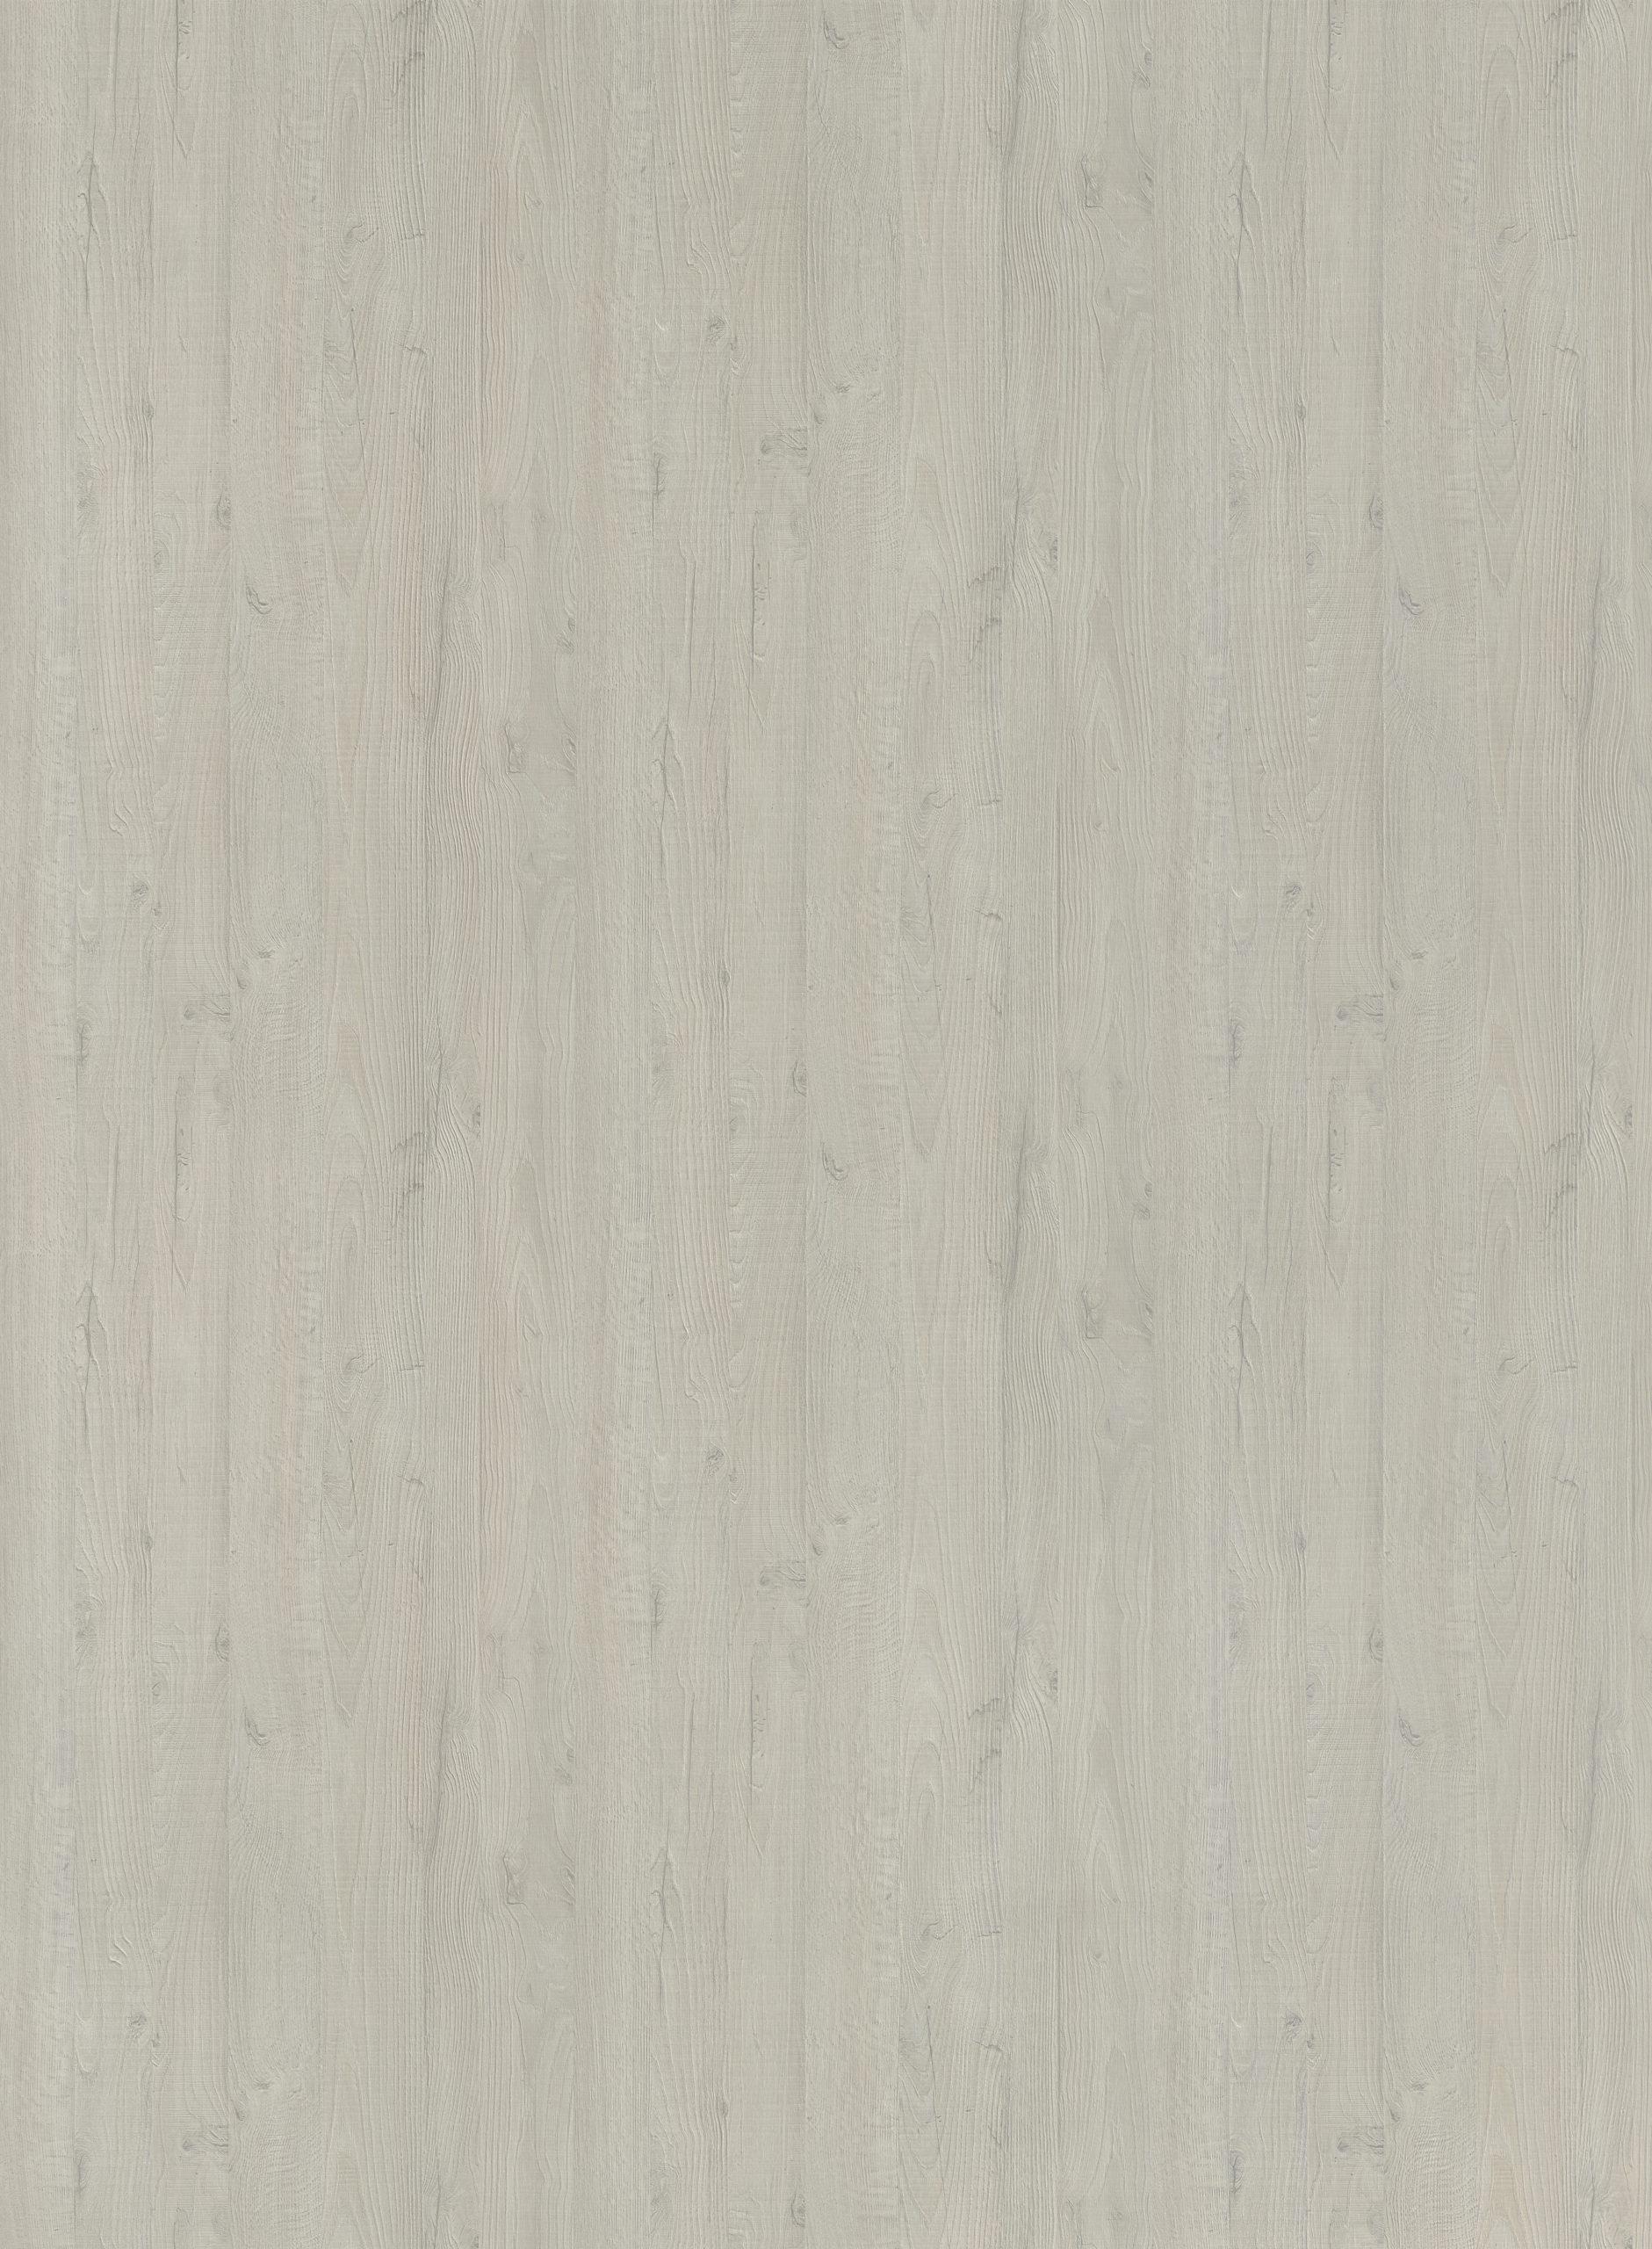 DecoLegno CLEAF, S070 Sherwood/Maloja, hele plaat afb. 2800x2070m/Tekenprogramma